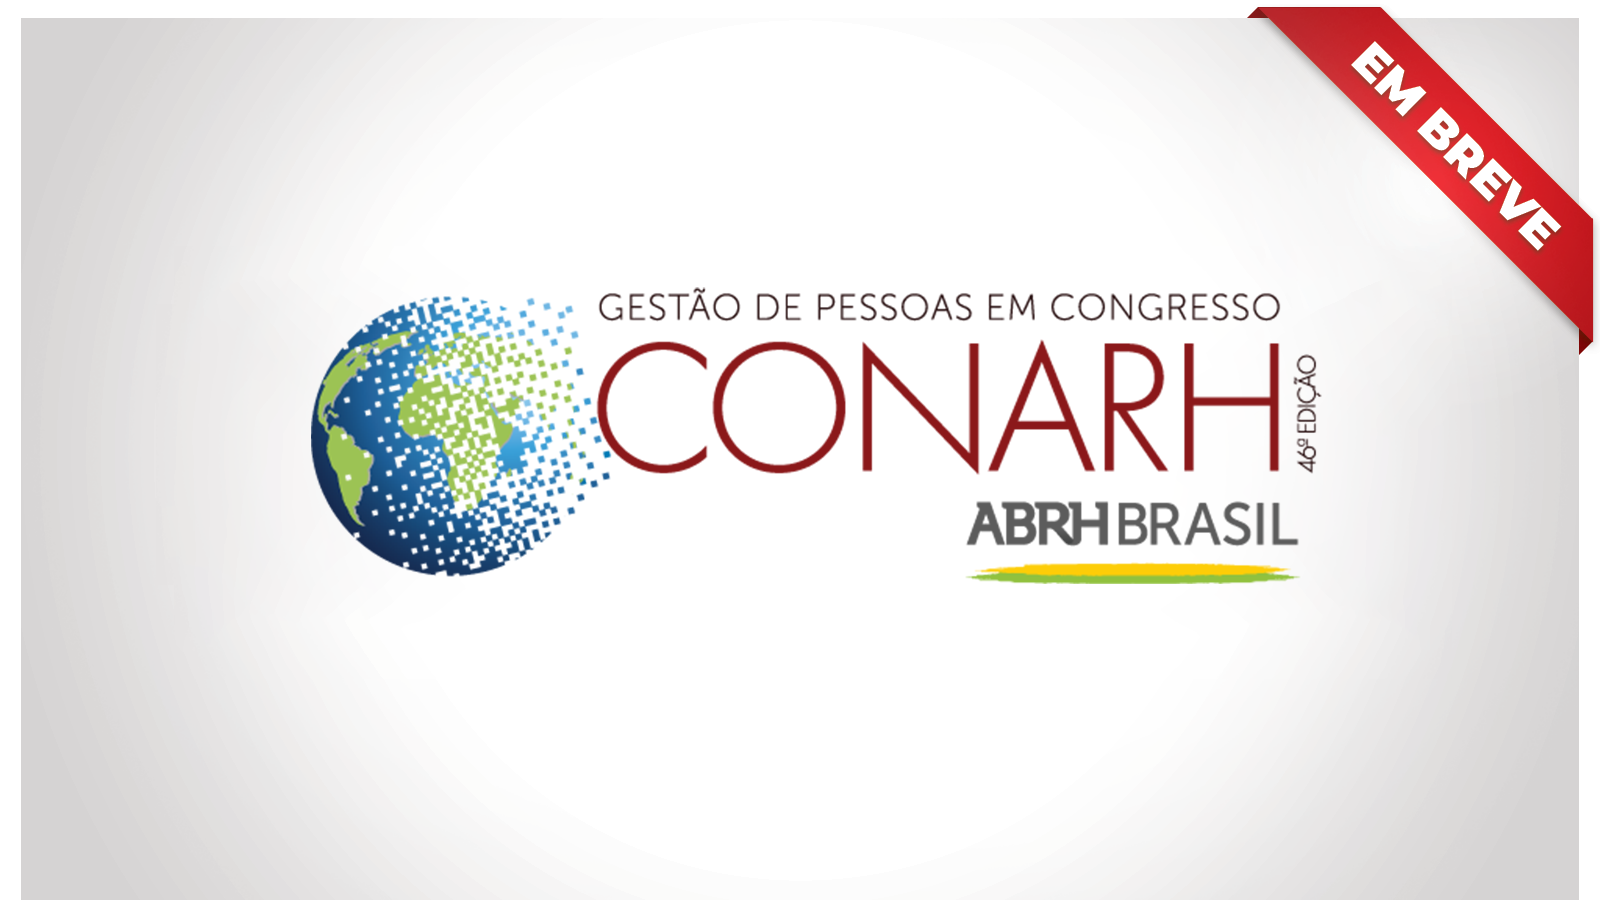 conarh-2019-em-breve